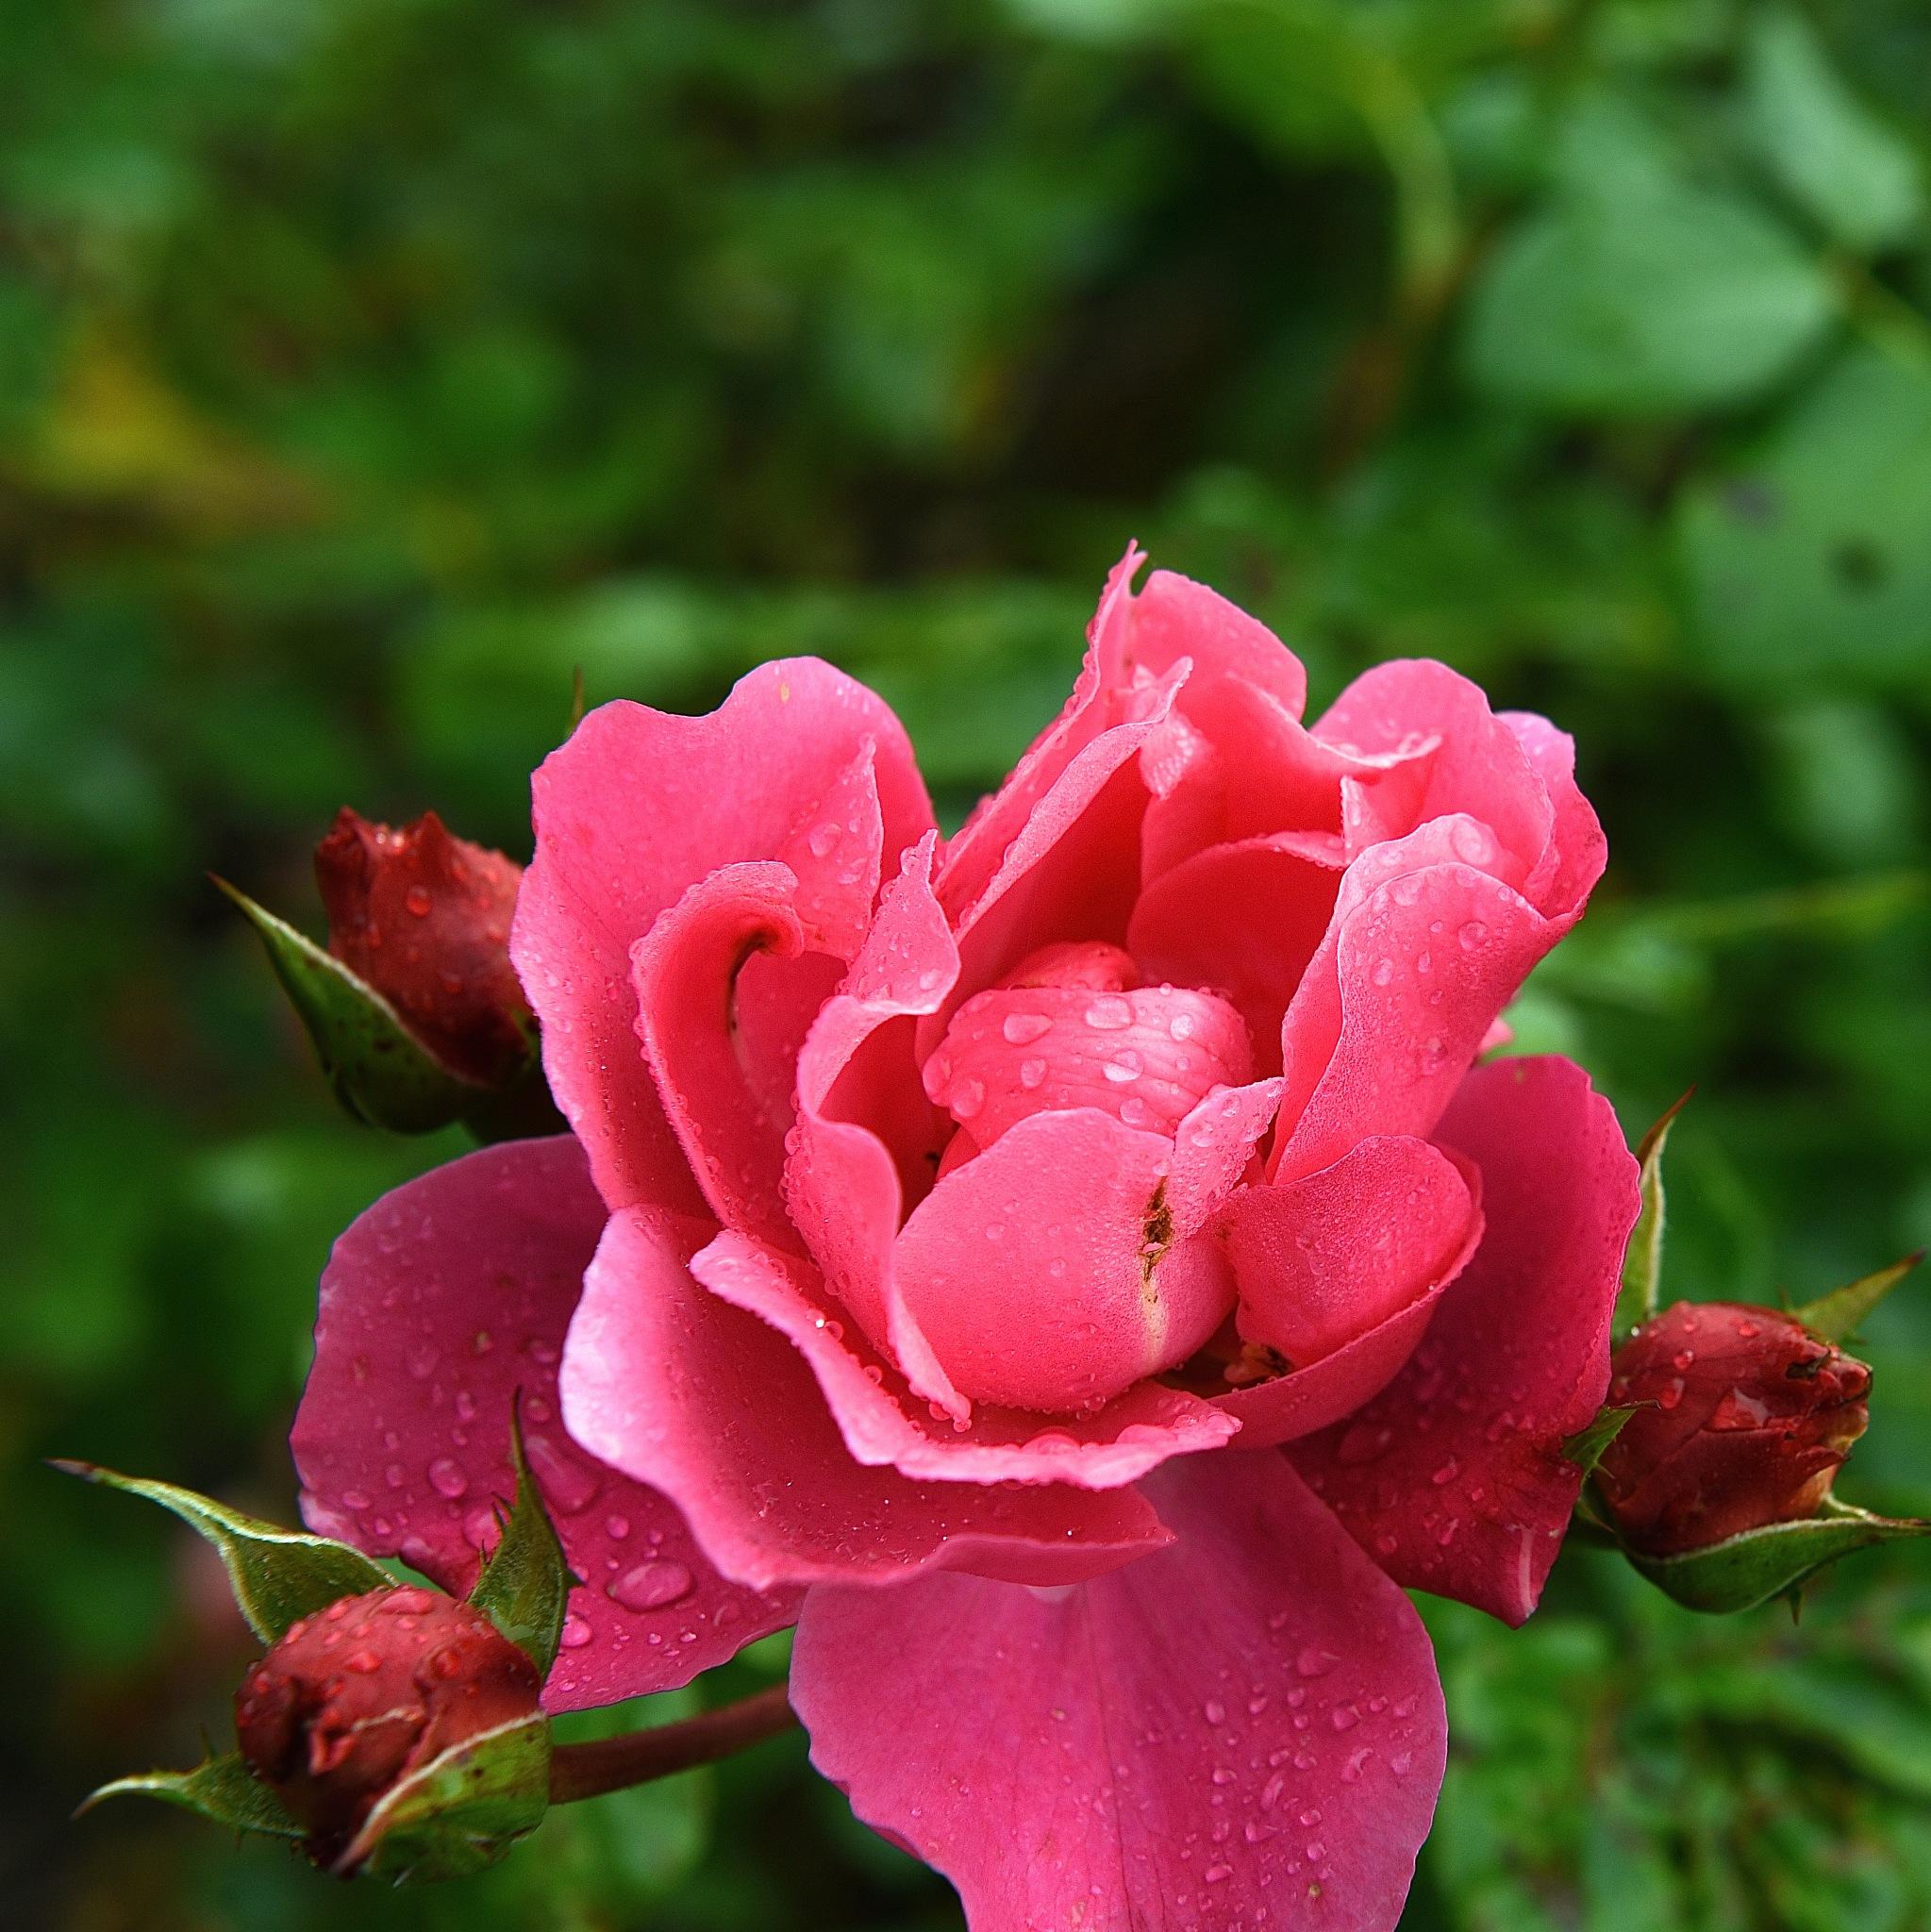 roses under the rain by Liliane Sticher